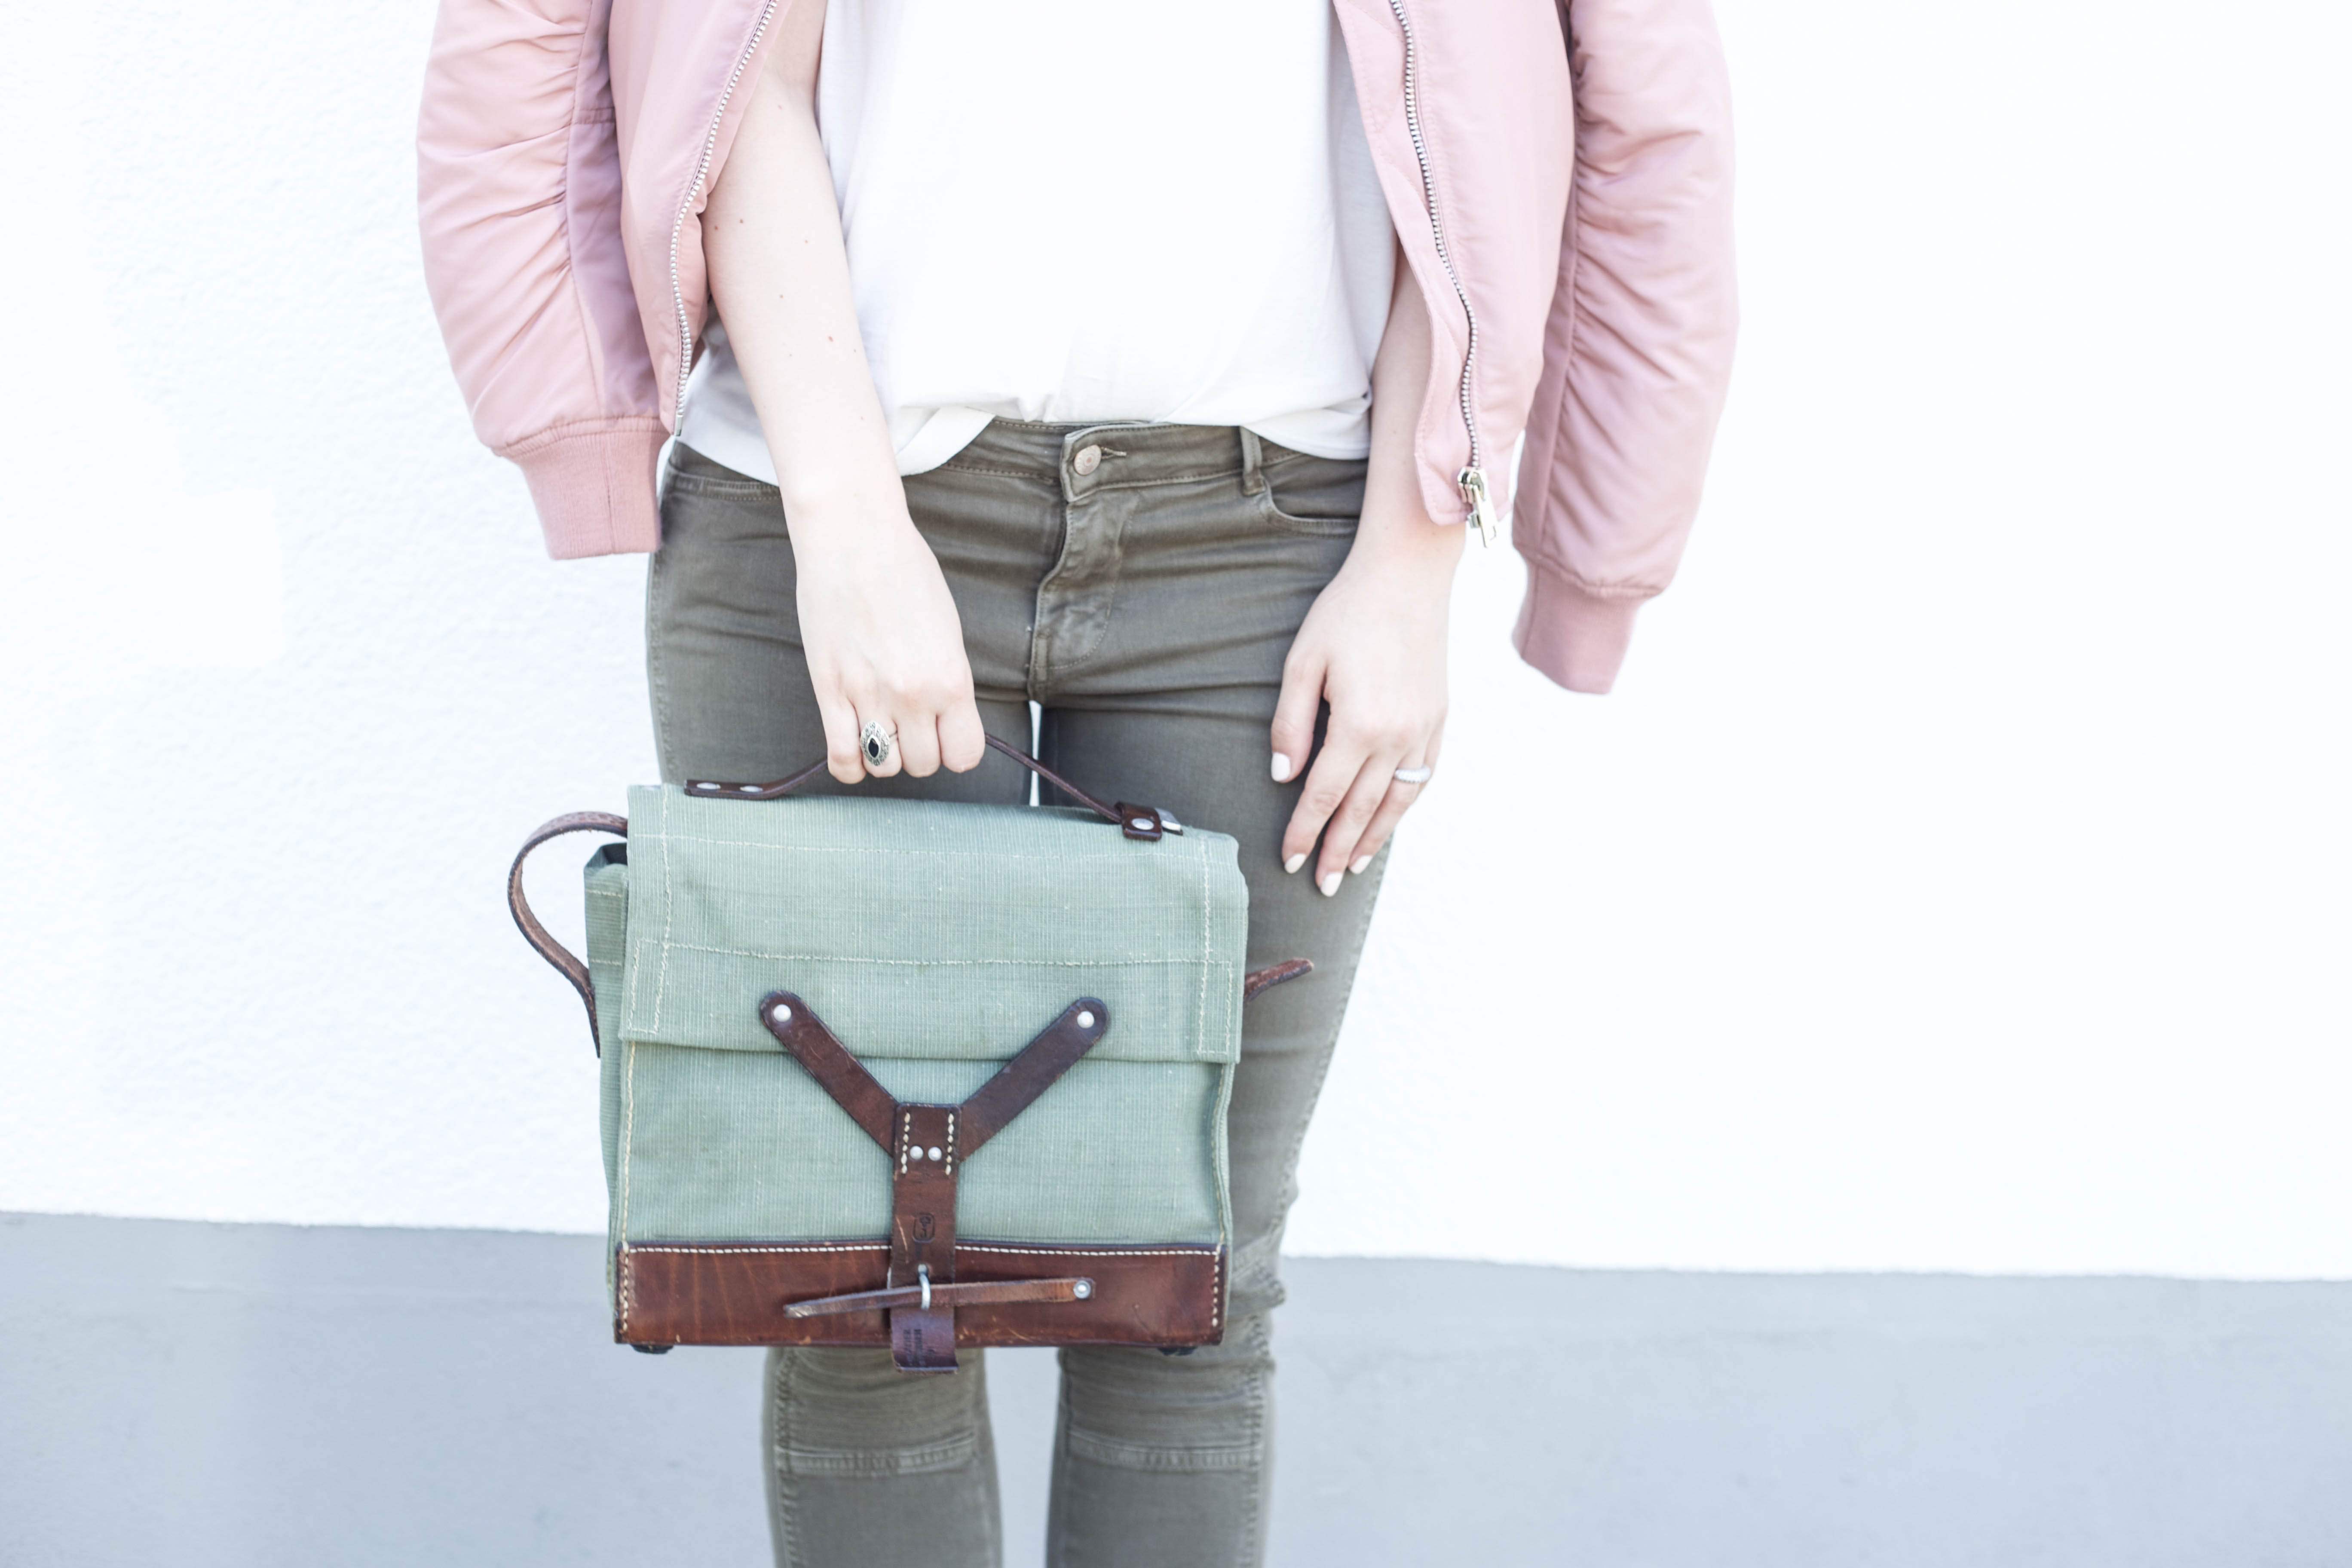 rosa-bomberjacke-weiße-sneaker-adidas superstars-outfit-fashionblog-cologne-berlin_0852